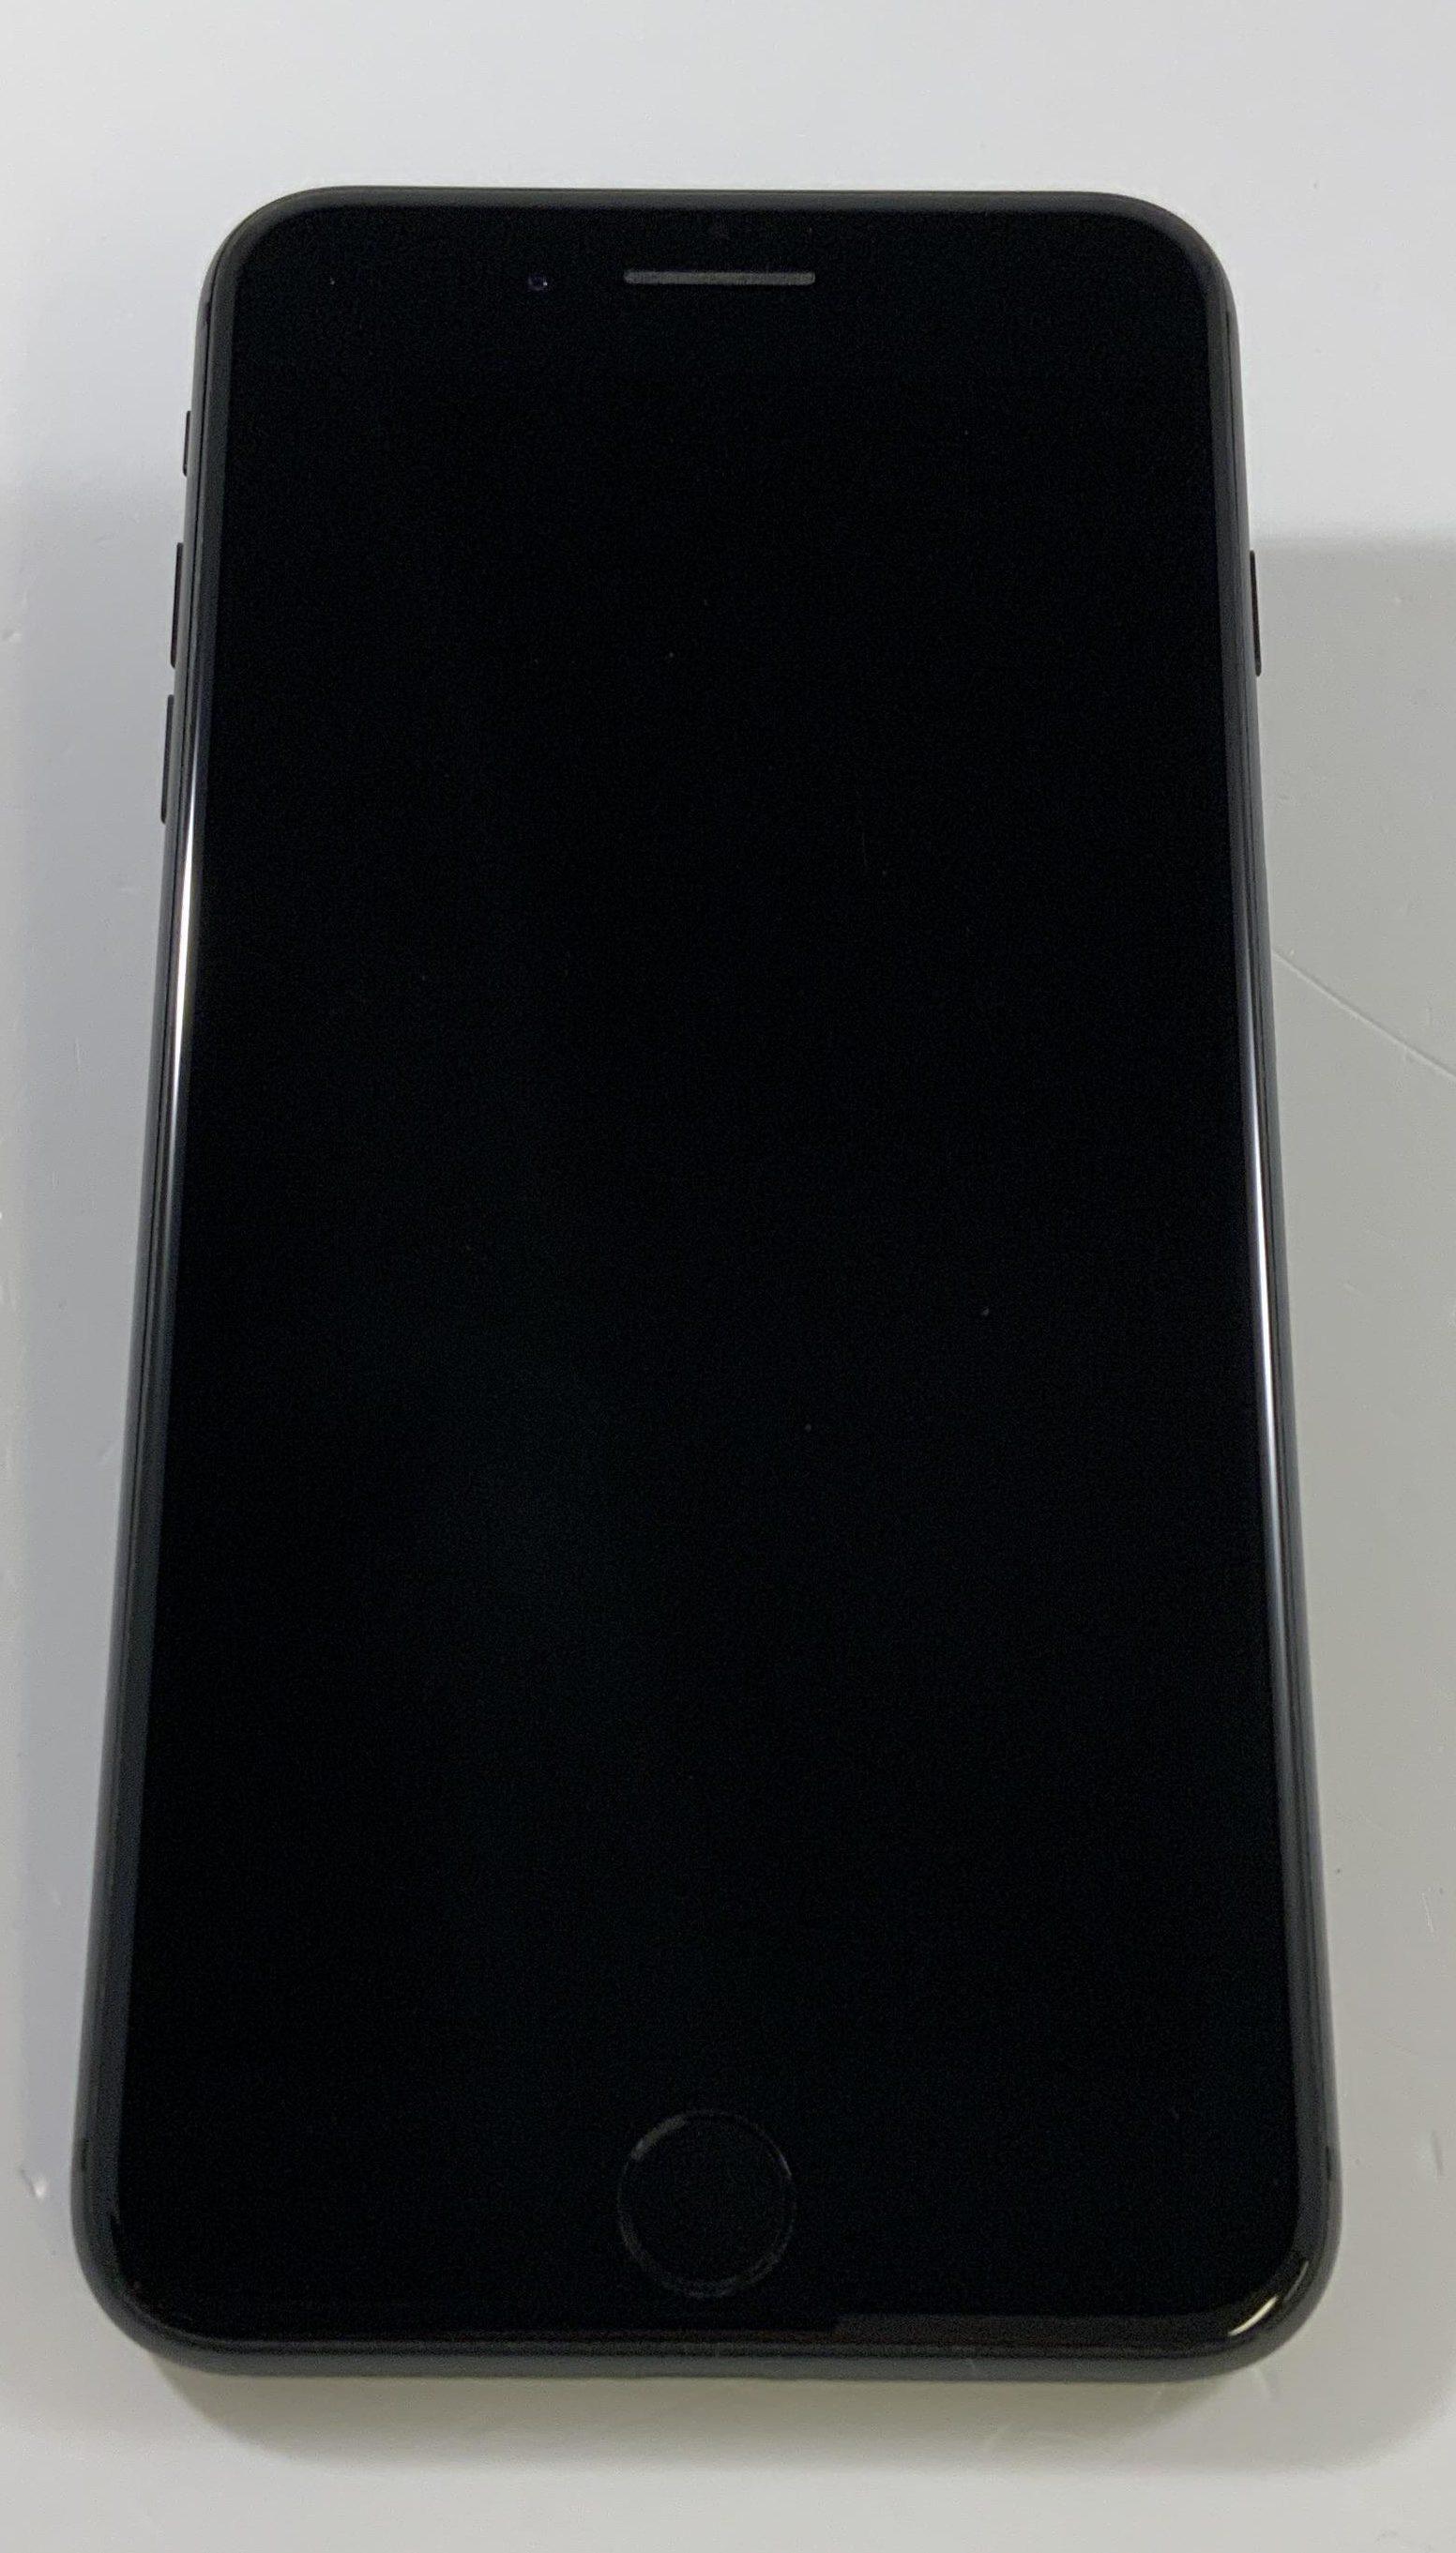 iPhone 8 Plus 256GB, 256GB, Space Gray, obraz 1